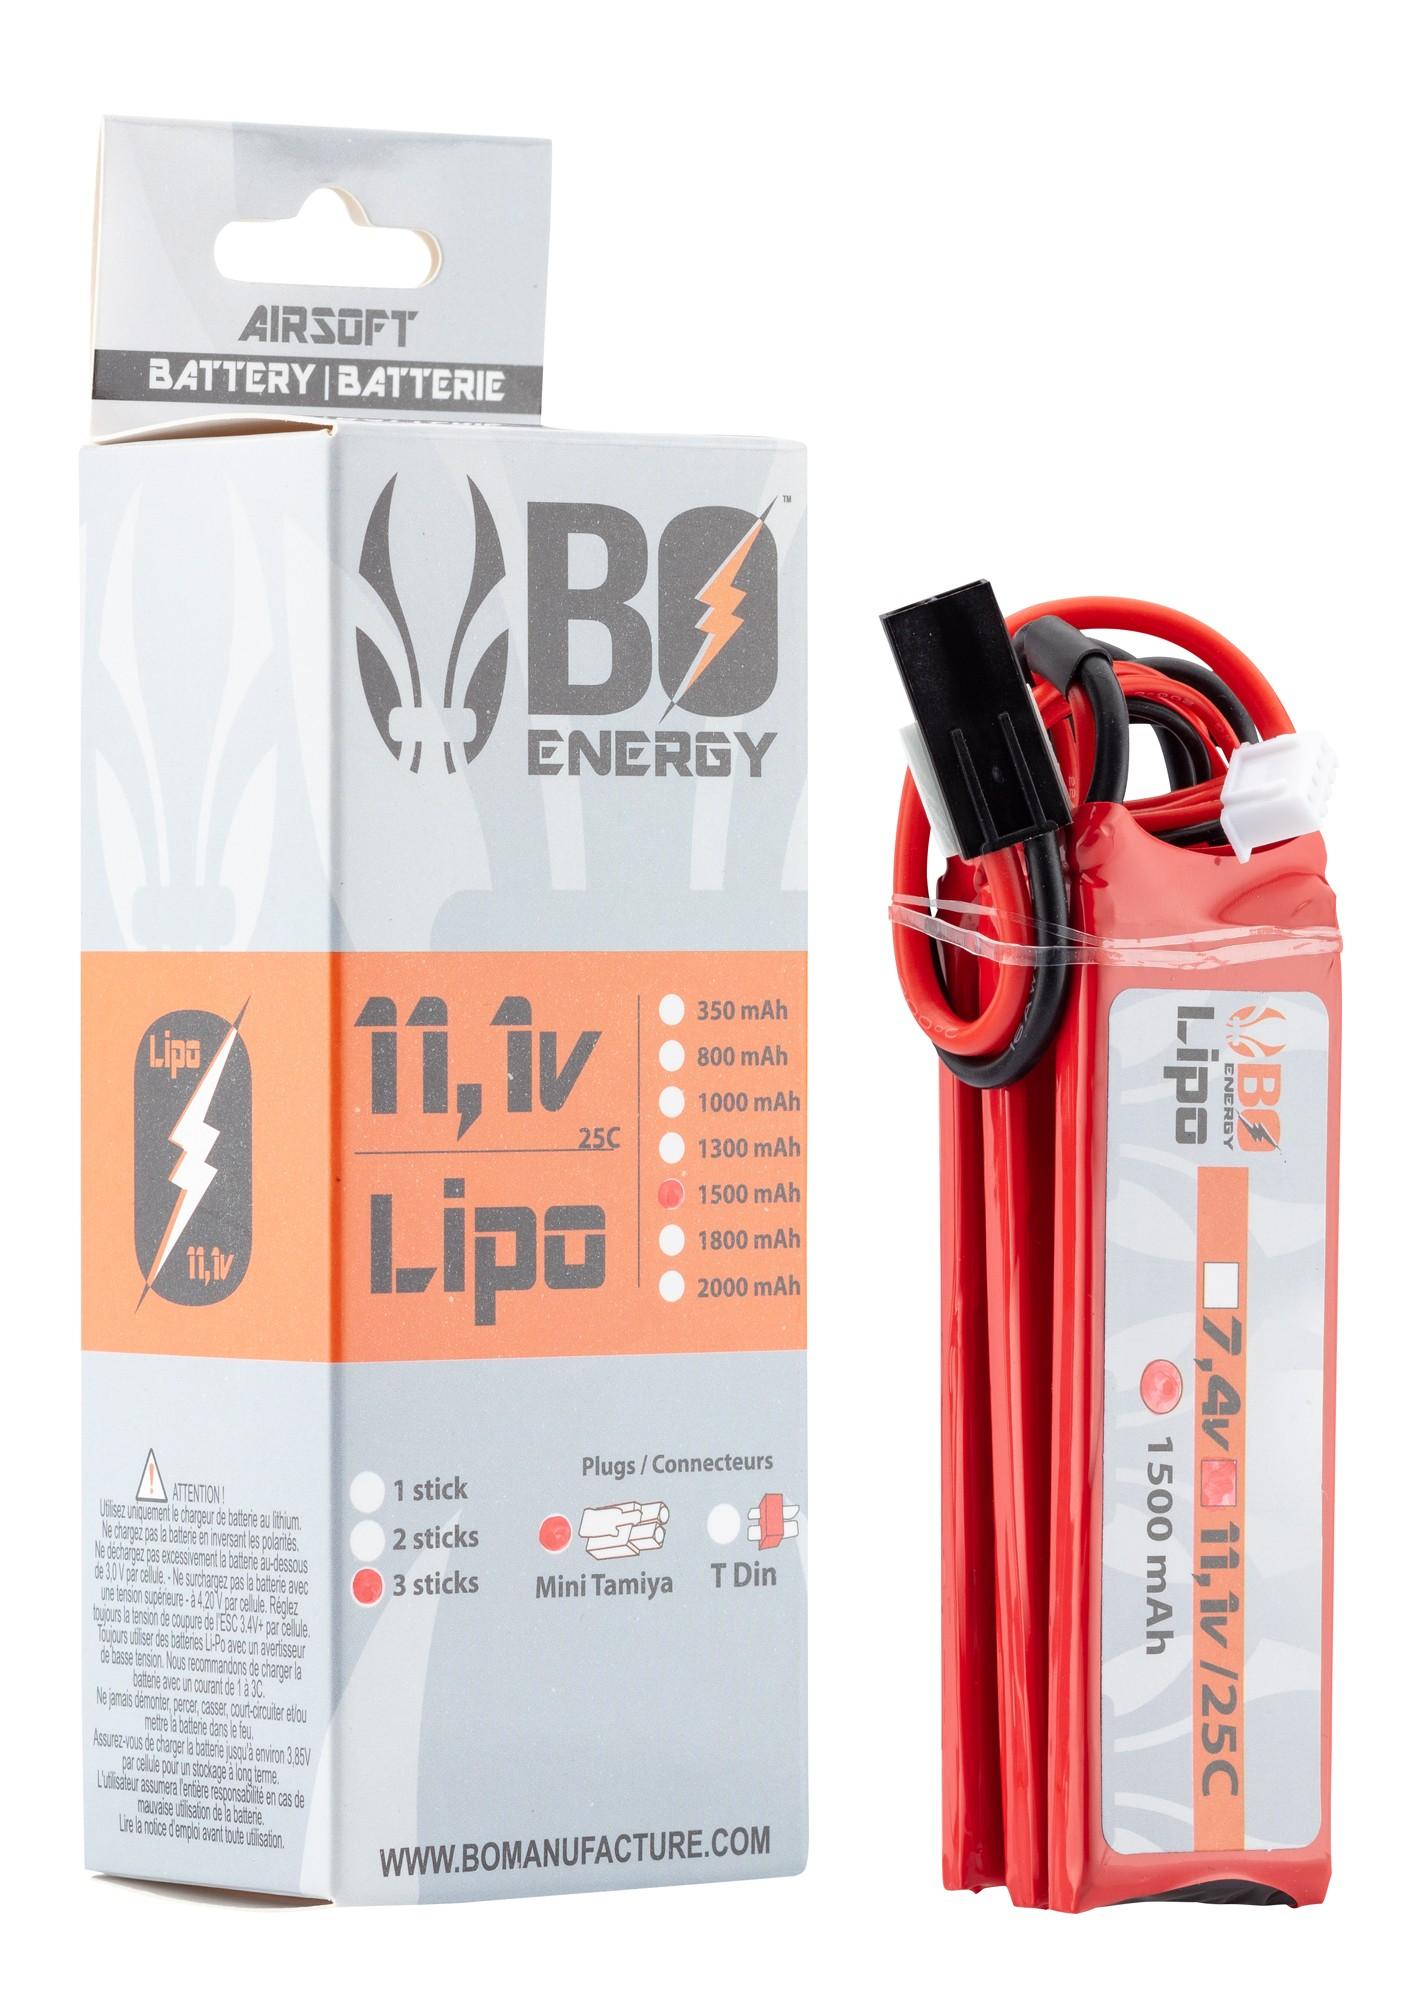 HRB Batteria LiPo 1500mAh 11.1V 25C 3S T per Elicottero ...